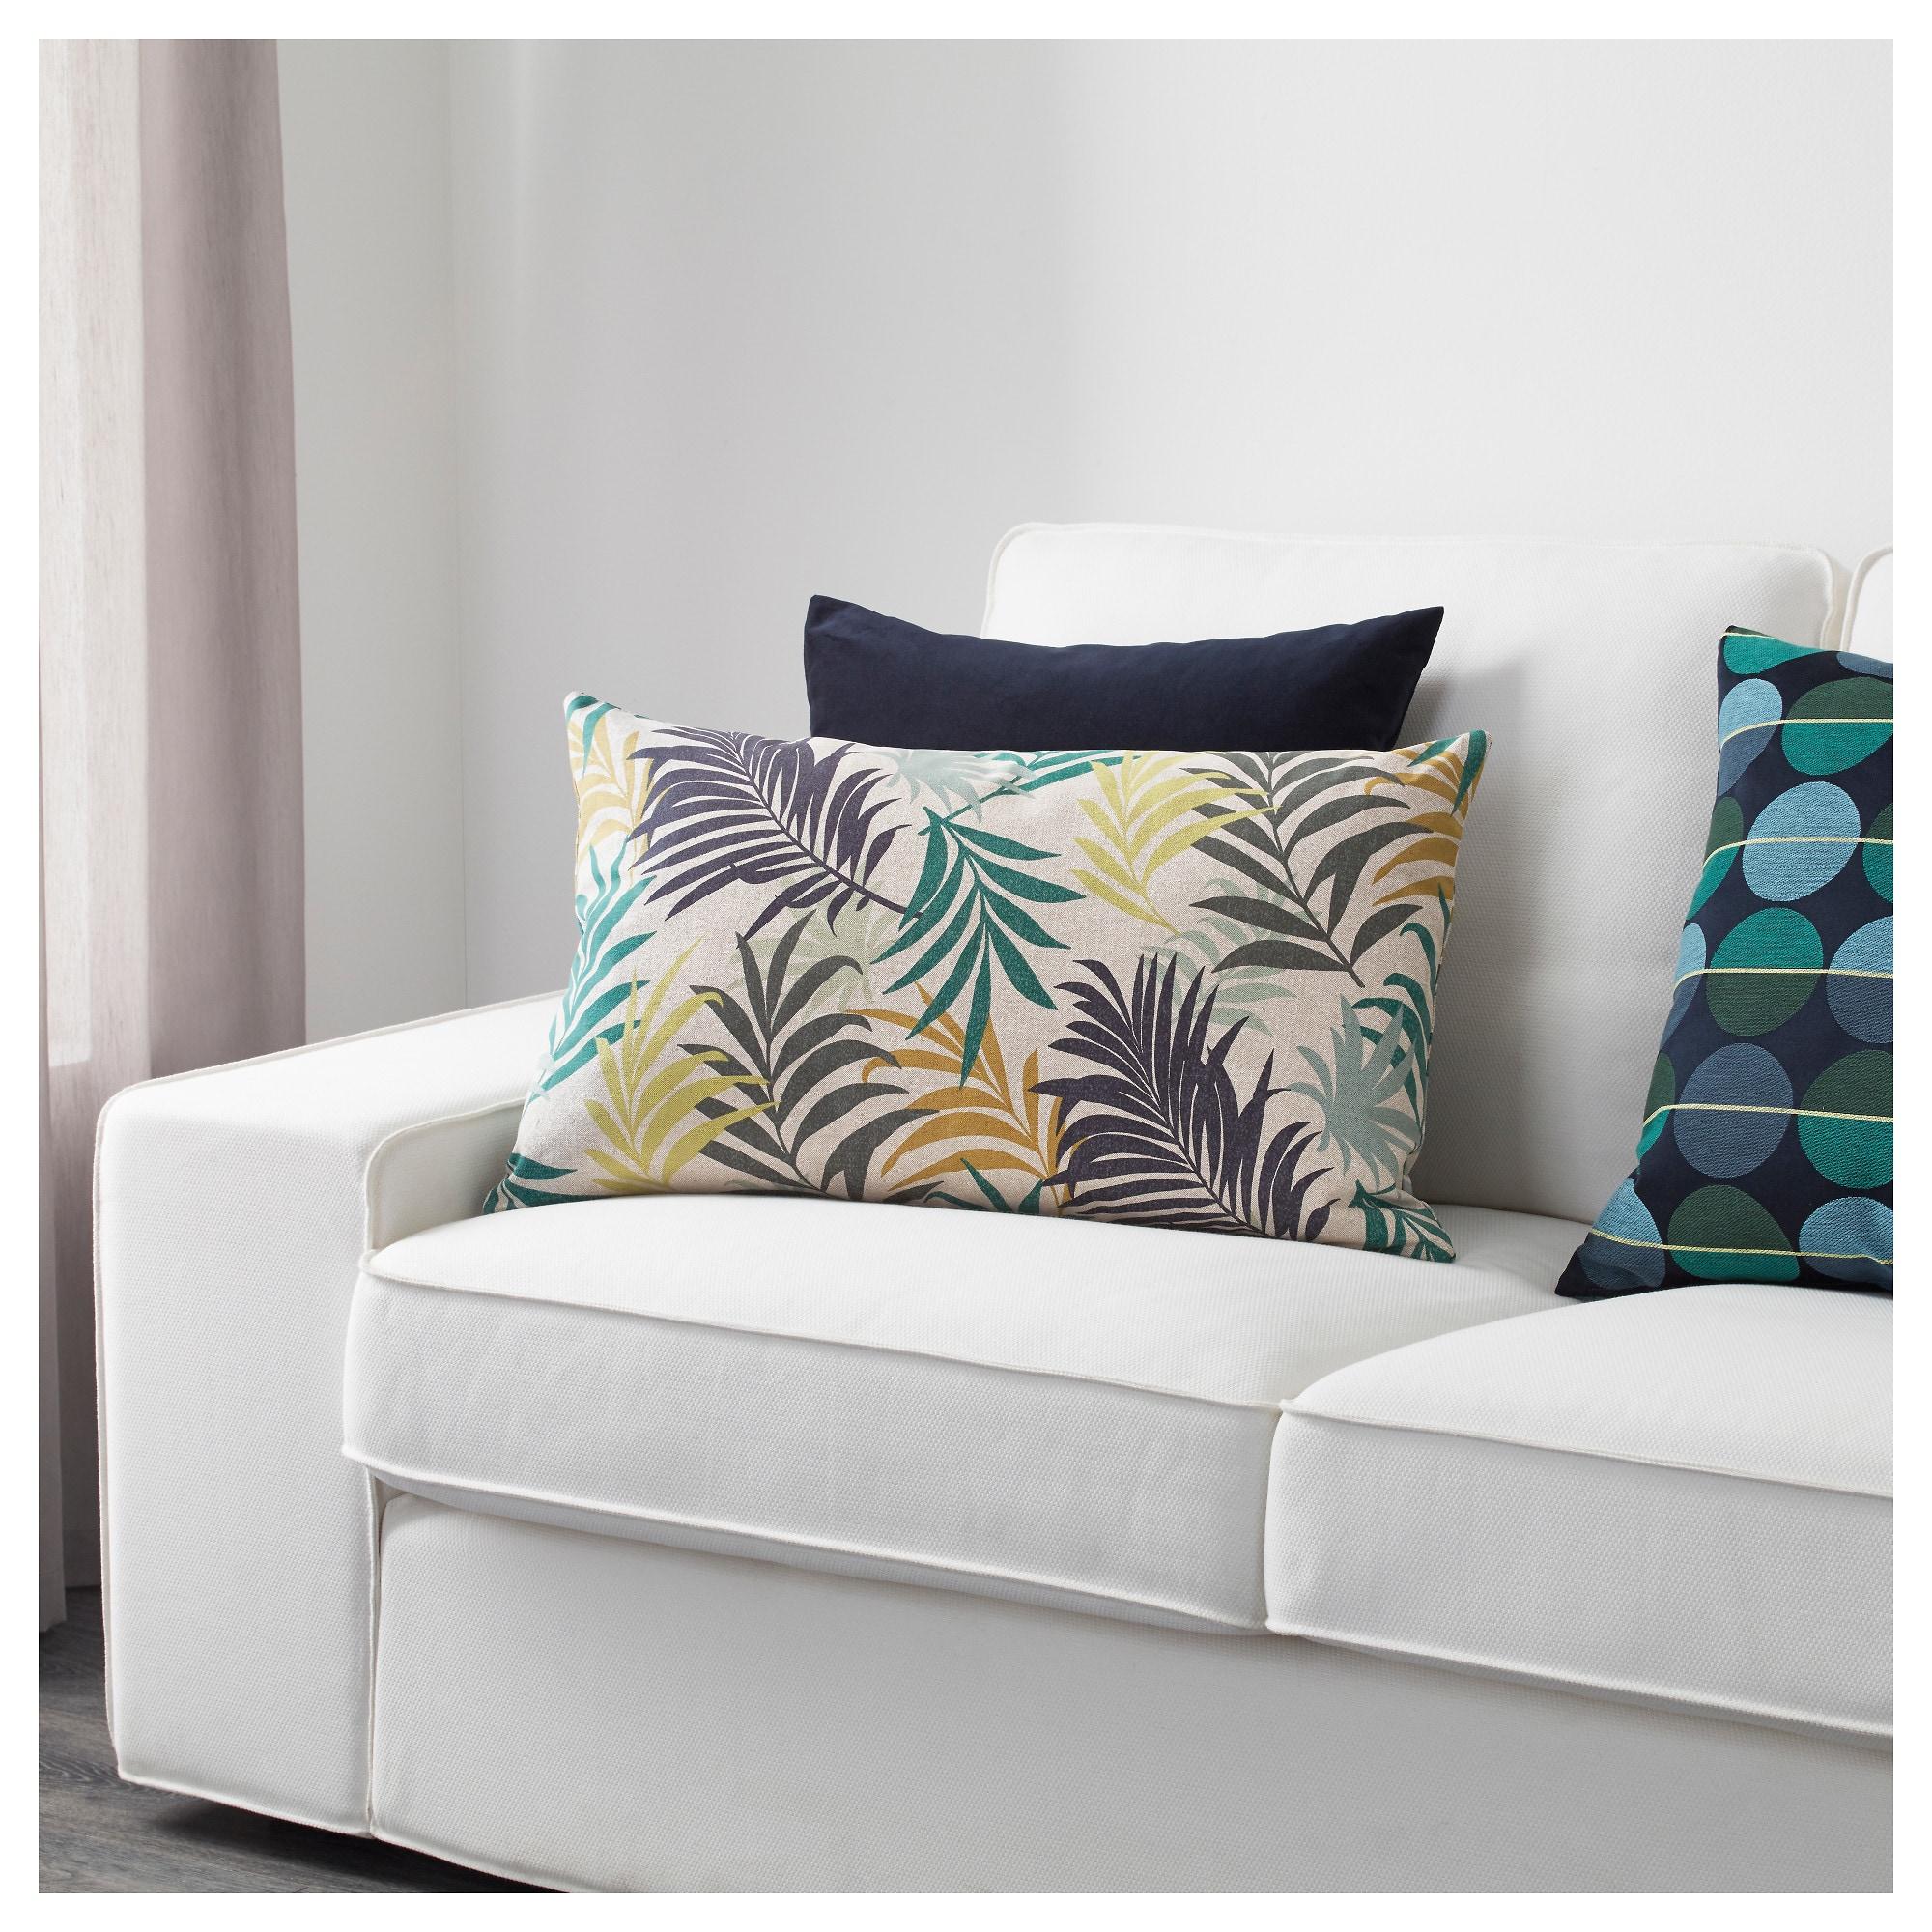 Чехлы для мягкой мебели: виды чехлов на диван